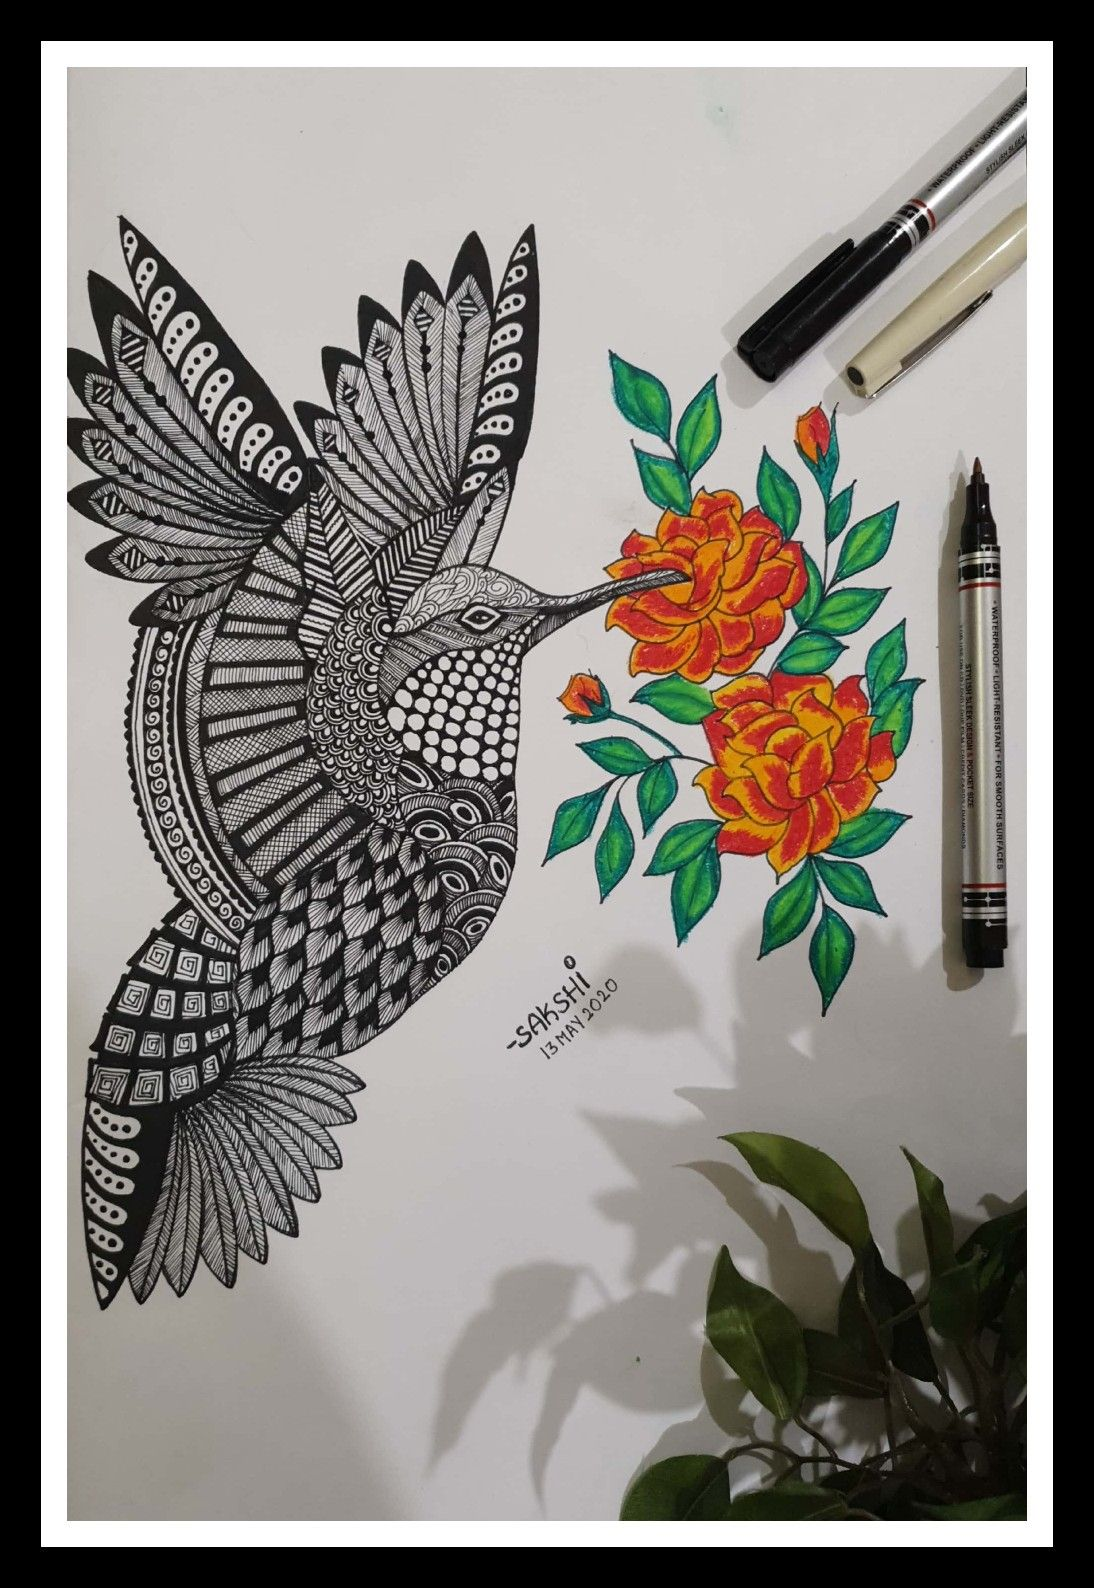 #drawing #sketch #rendering #birdsketch #nature #art #artgram #draw #painting🎨 #fly #rotering #blacksketch #hemmingbird #lovetopaint #color #drawingskills #myart #sketchbook #artist #portrait #artoftheday #zentangle #doodle #creative #artwork